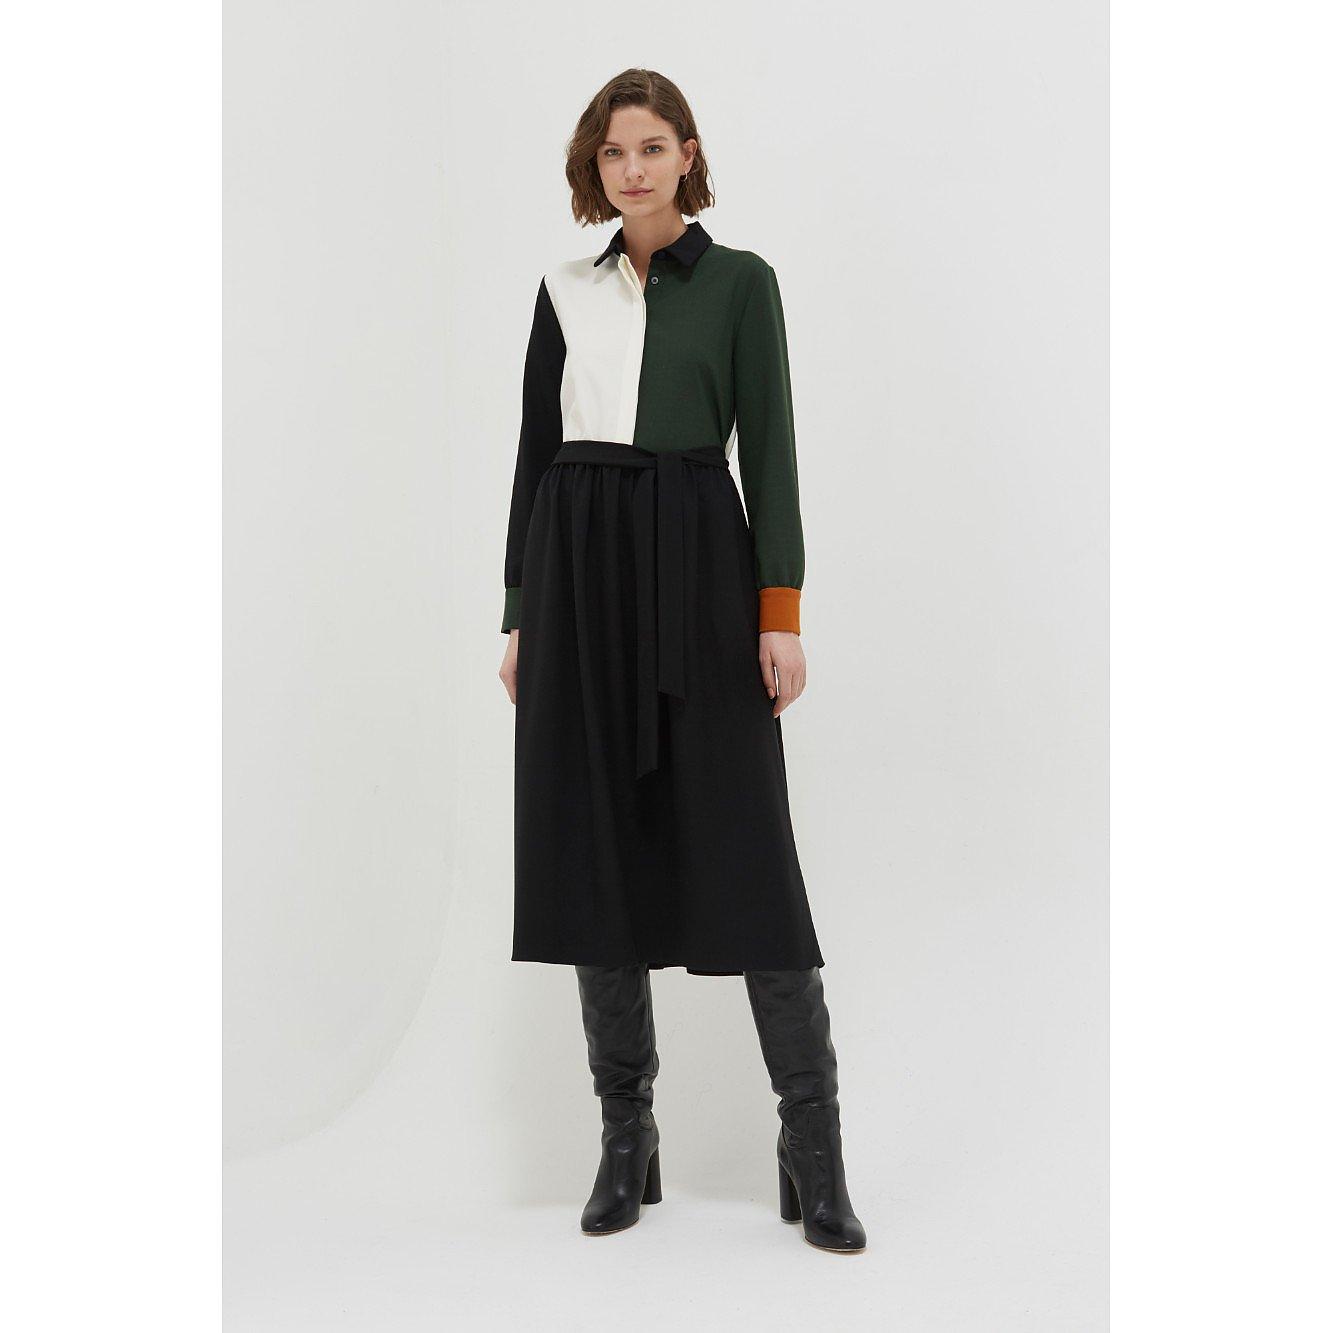 Chinti and Parker Colour-Block Wool Twill Shirt Dress